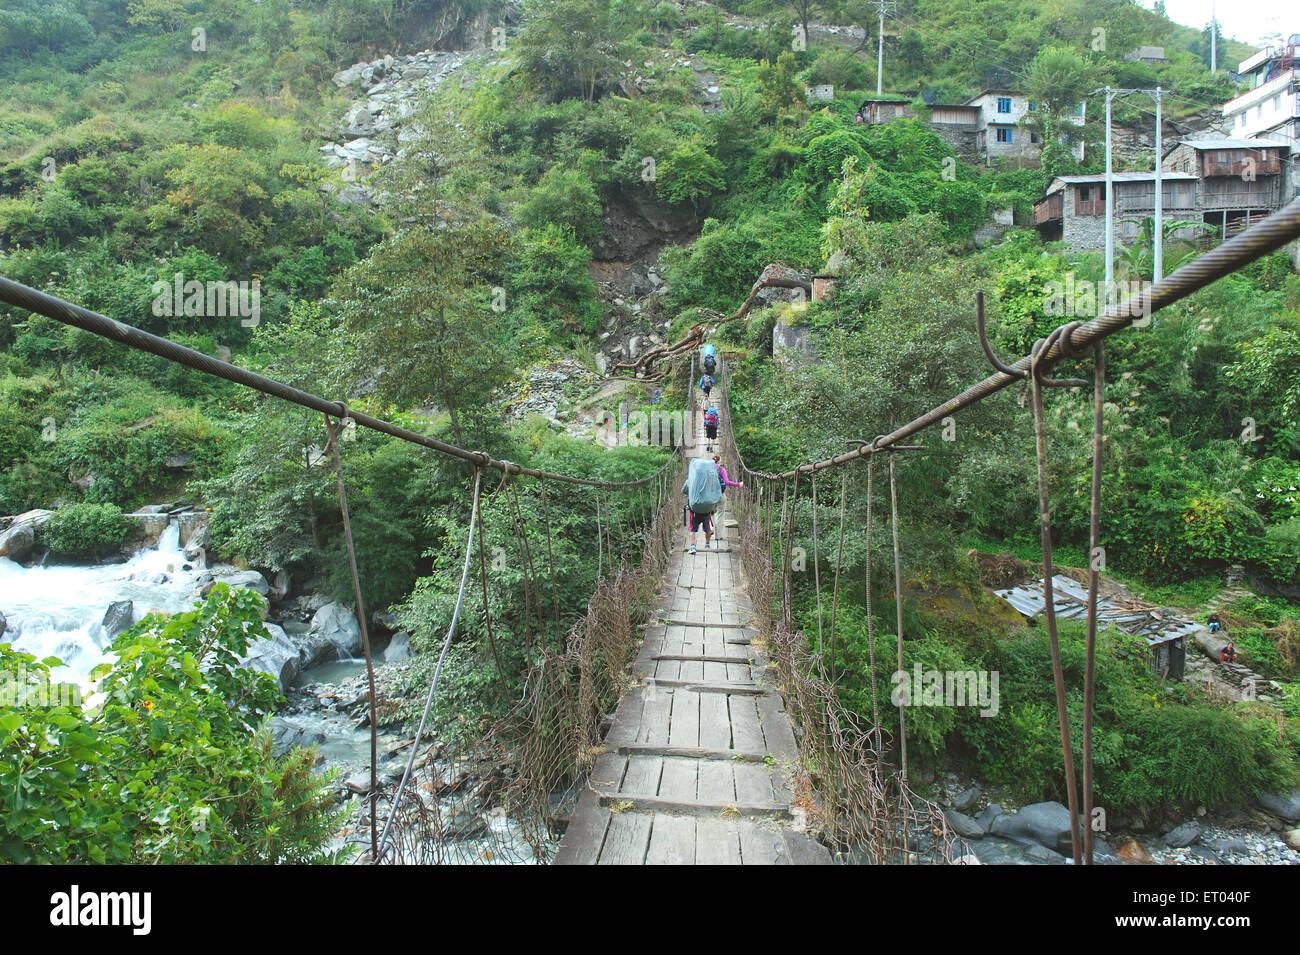 Trekker crossing river ; Tatopani ; Nepal - Stock Image